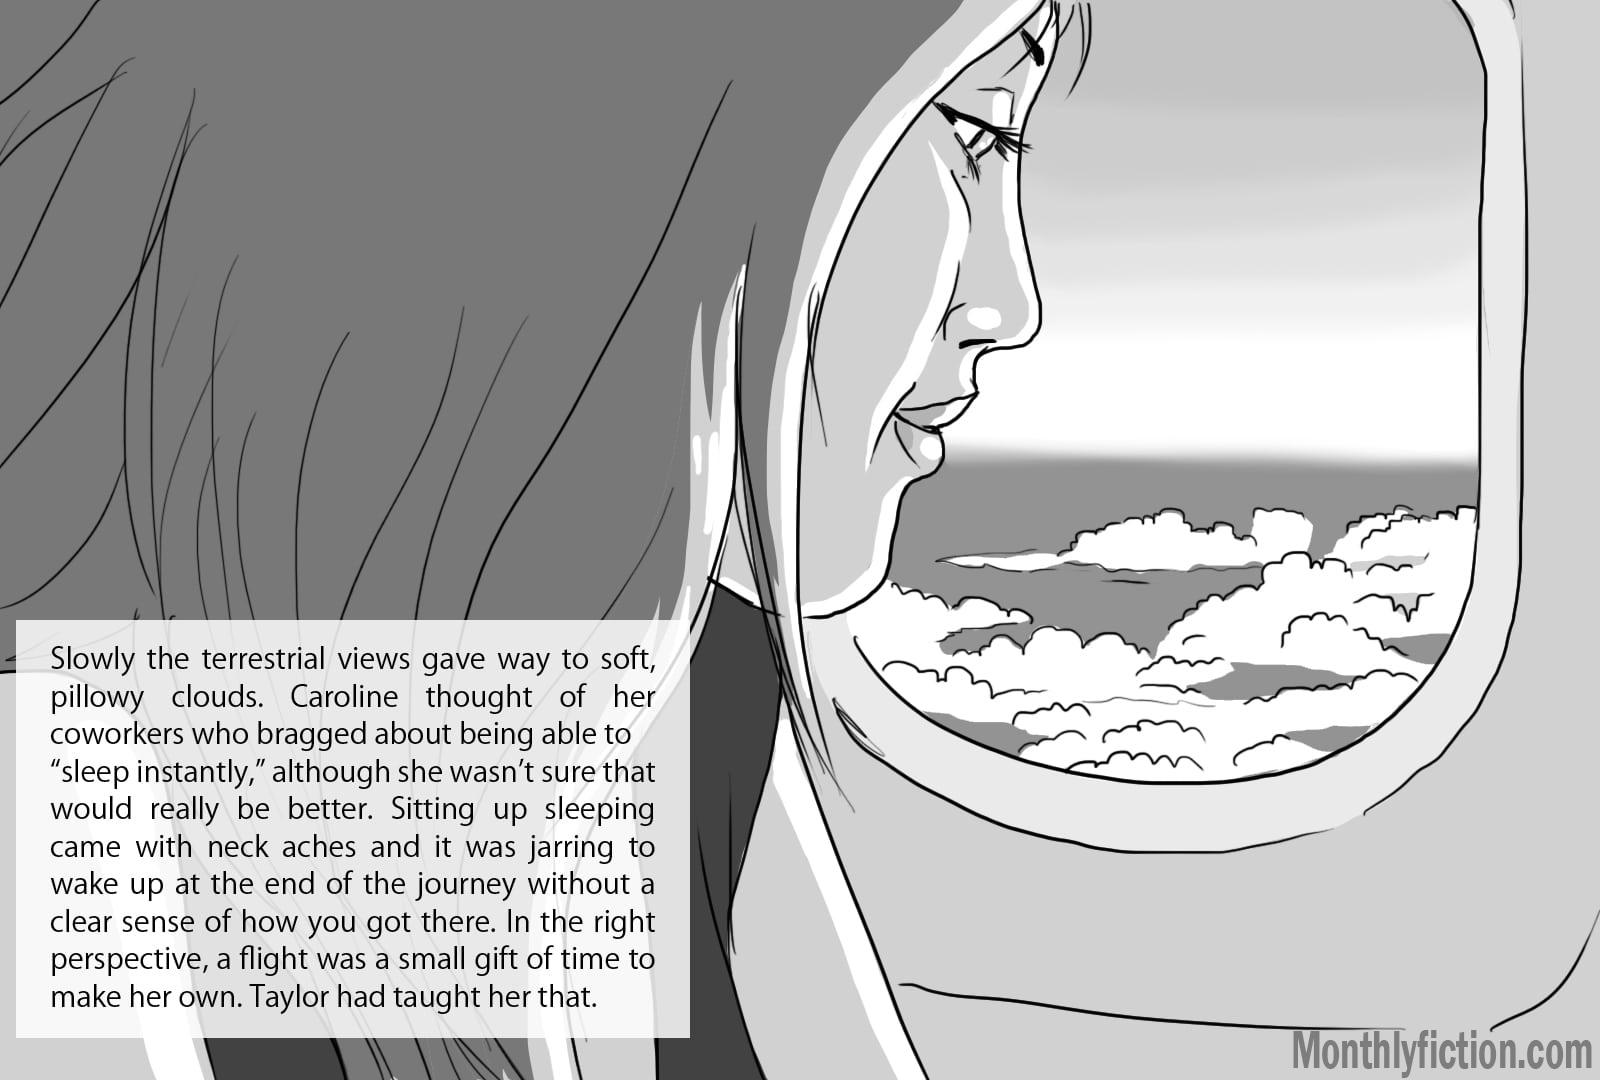 Monthly Fiction Takeoffs and landings illustration illustraded story deborah burke camilo sandoval page 7